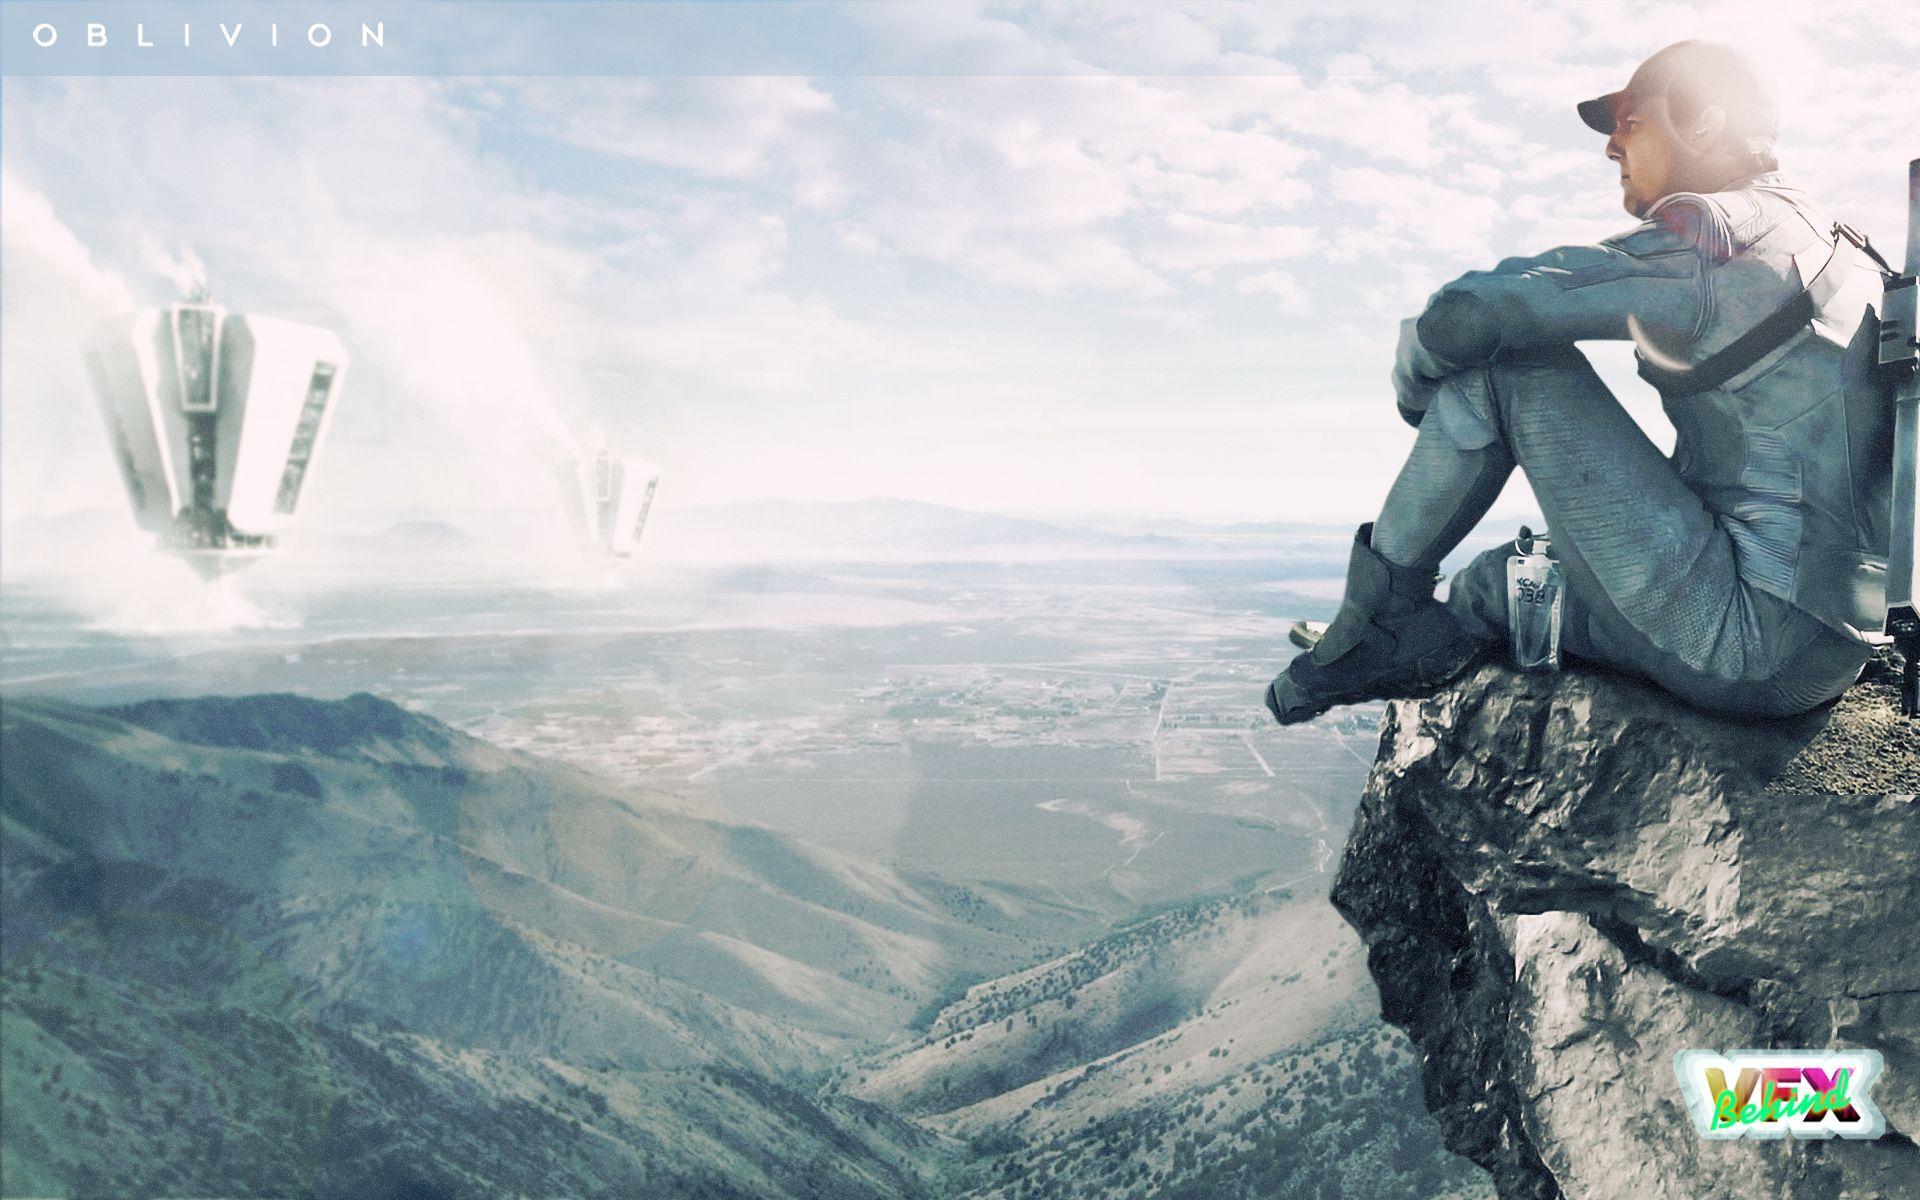 Oblivion Wallpapers - Top Free Oblivion